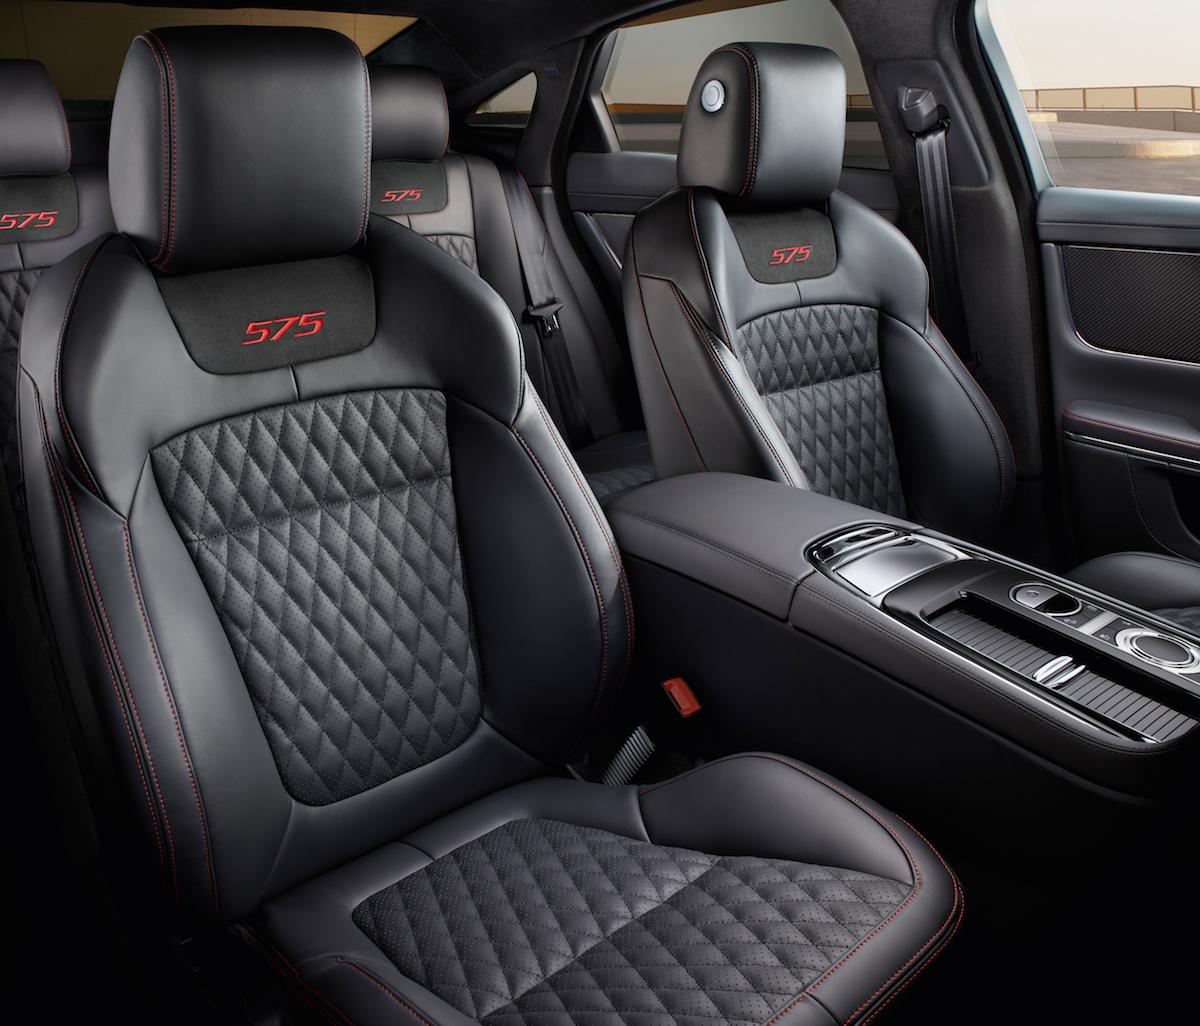 jaguar xj luxuslimousine limousine neu modelle preise allrad neuheiten 2017 2018 allrad motoren interieur